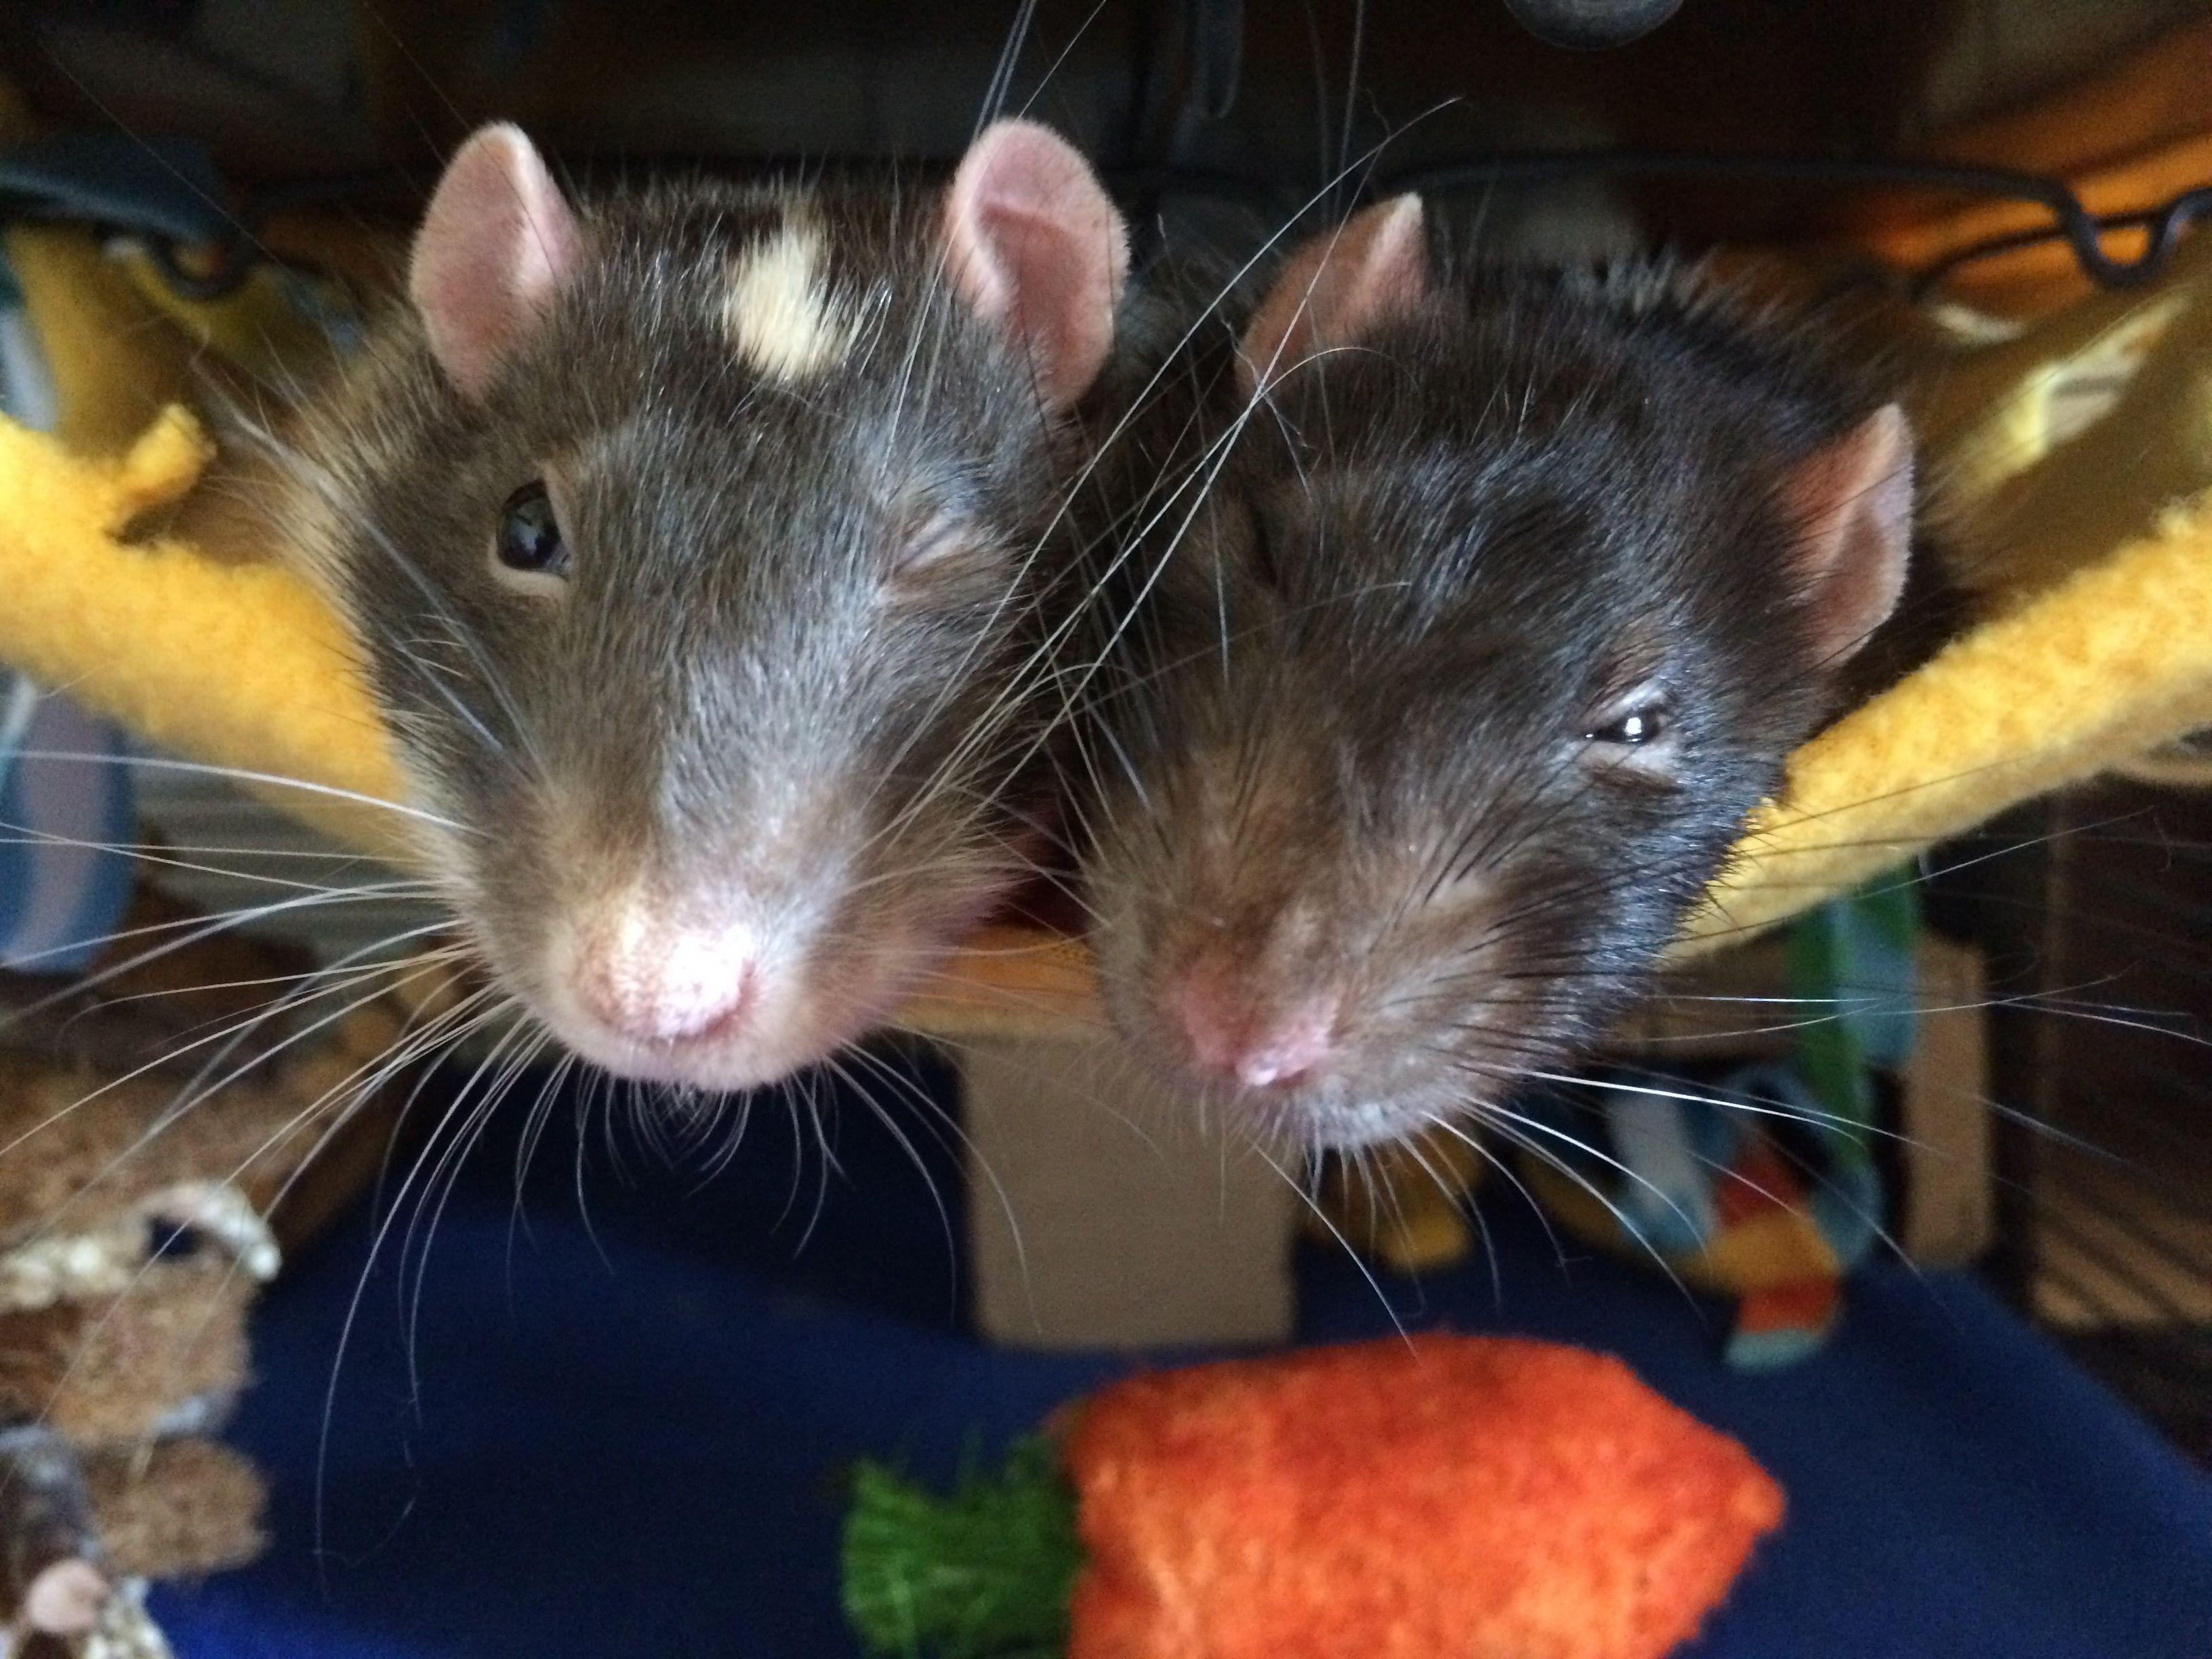 Here S Lookin At You Hooman Aww Cute Rat Cuterats Ratsofpinterest Cuddle Fluffy Animals Pets Bestfriend Ittssofluffy Cute Rats Pet Rats Small Pets